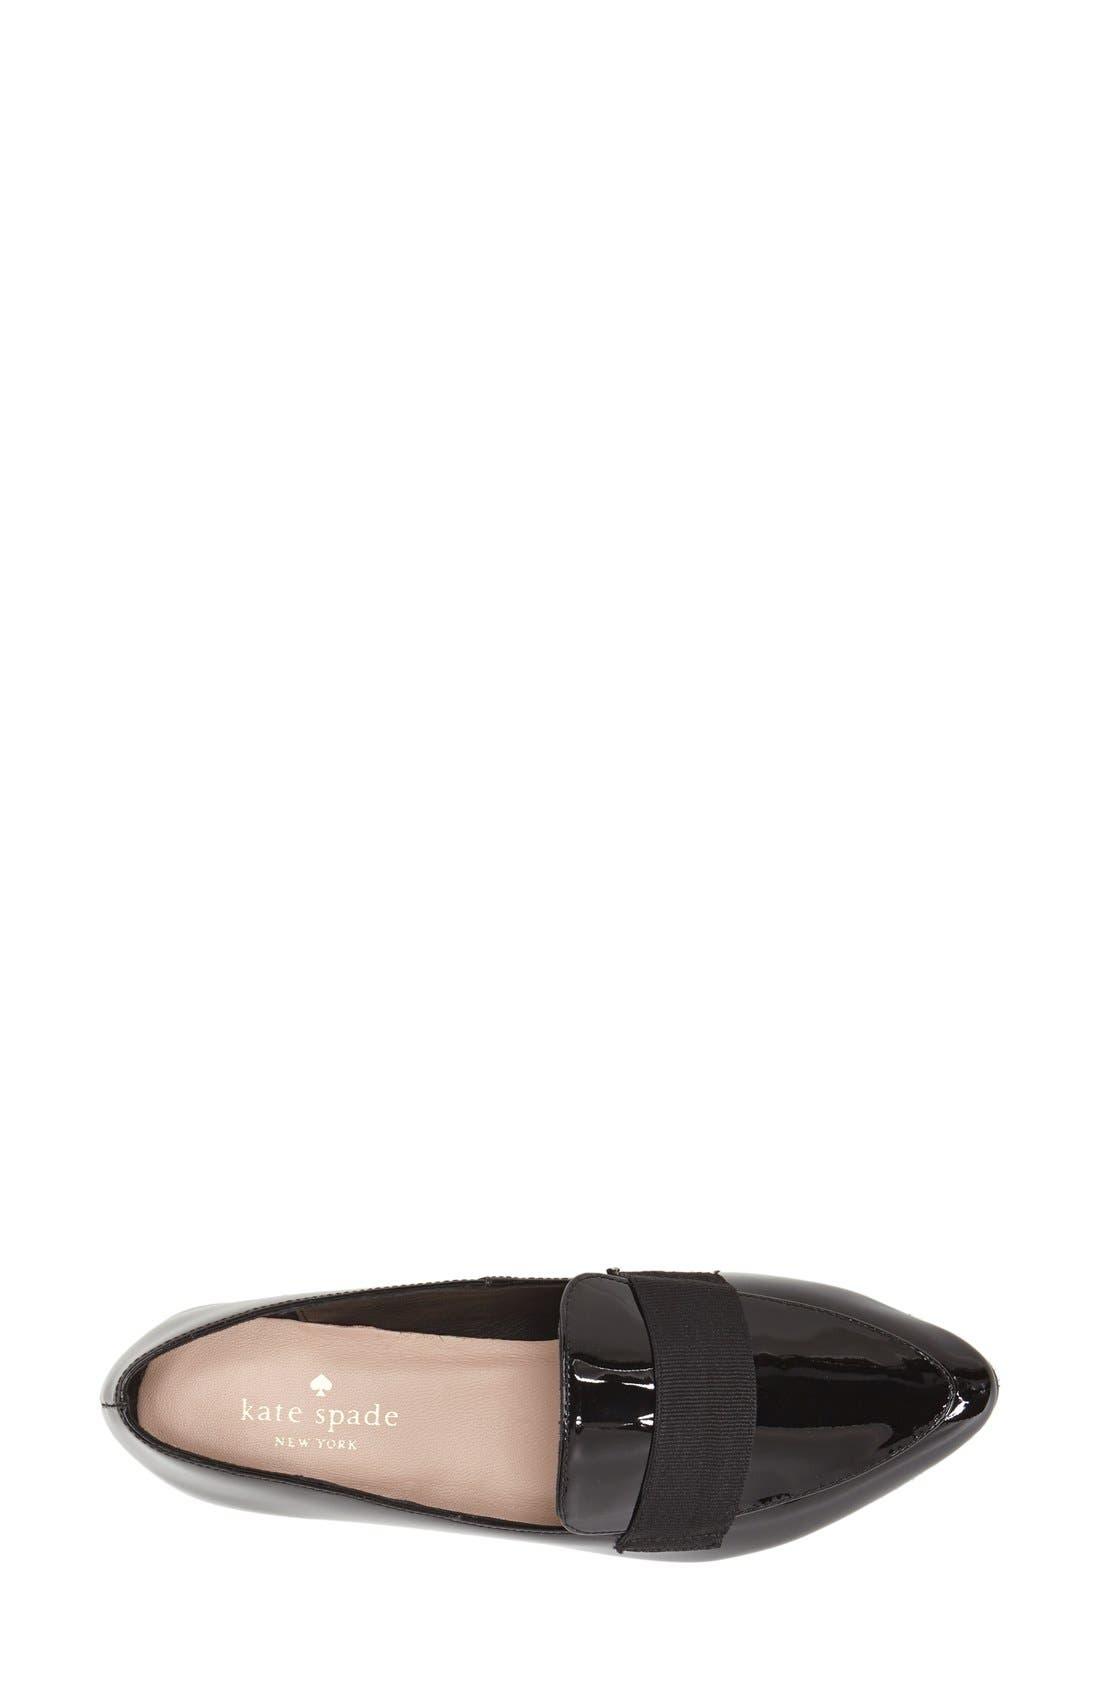 Alternate Image 3  - kate spade new york 'corina' pointy toe loafer (Women)